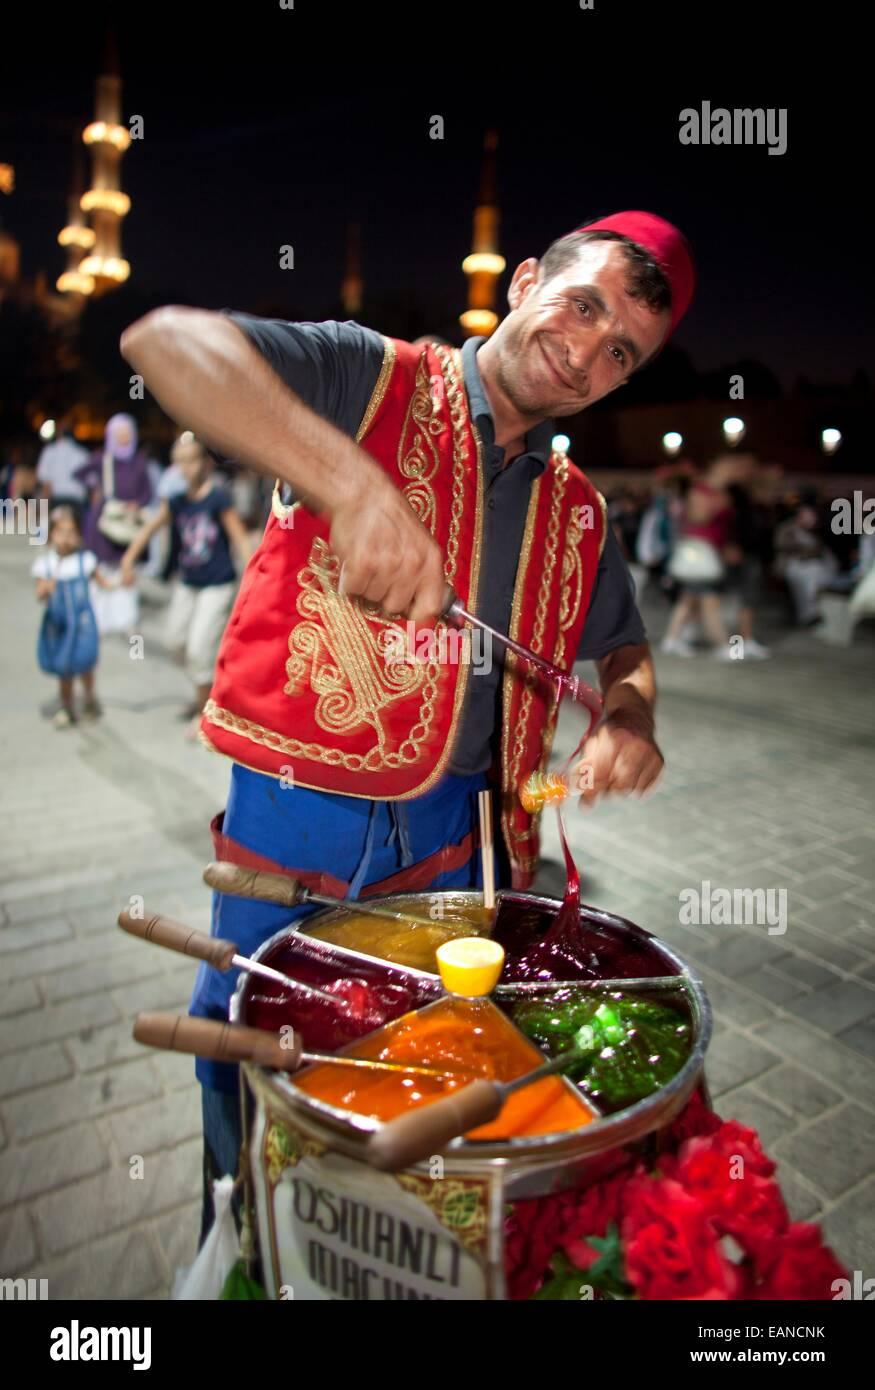 Vendedores ambulantes vendiendo dulces, Estambul Imagen De Stock